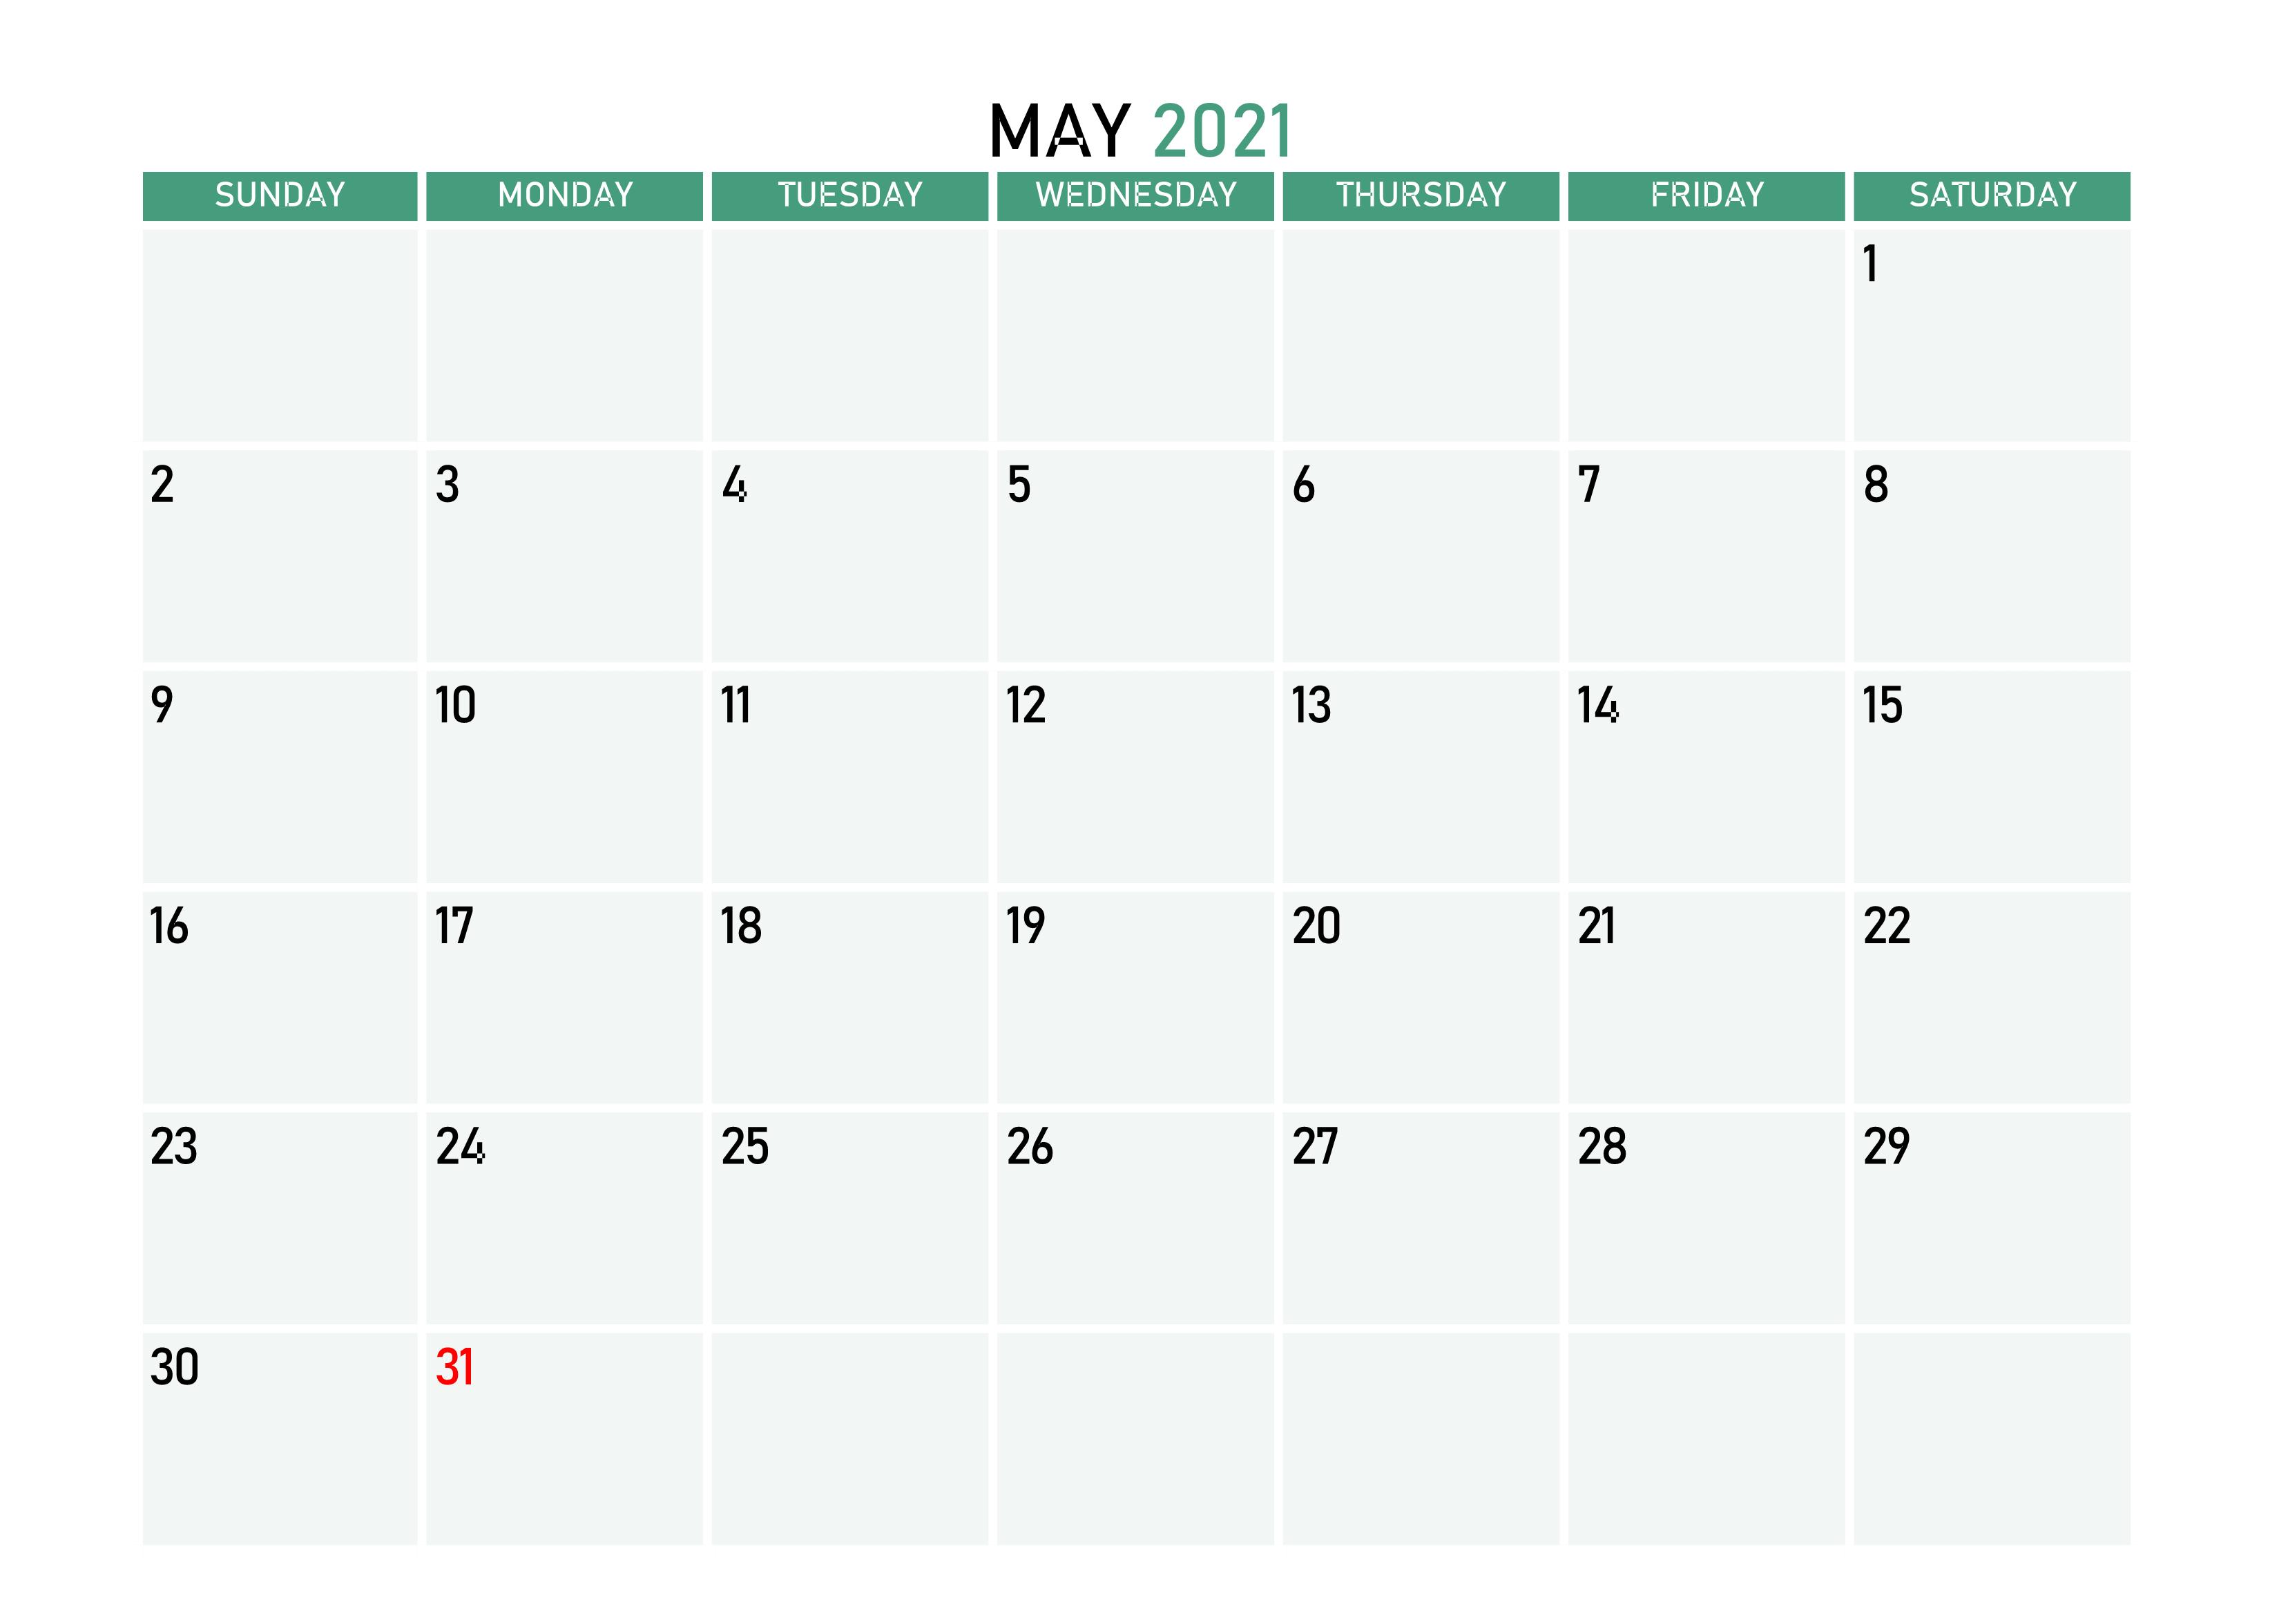 May 2021 Desk Calendar